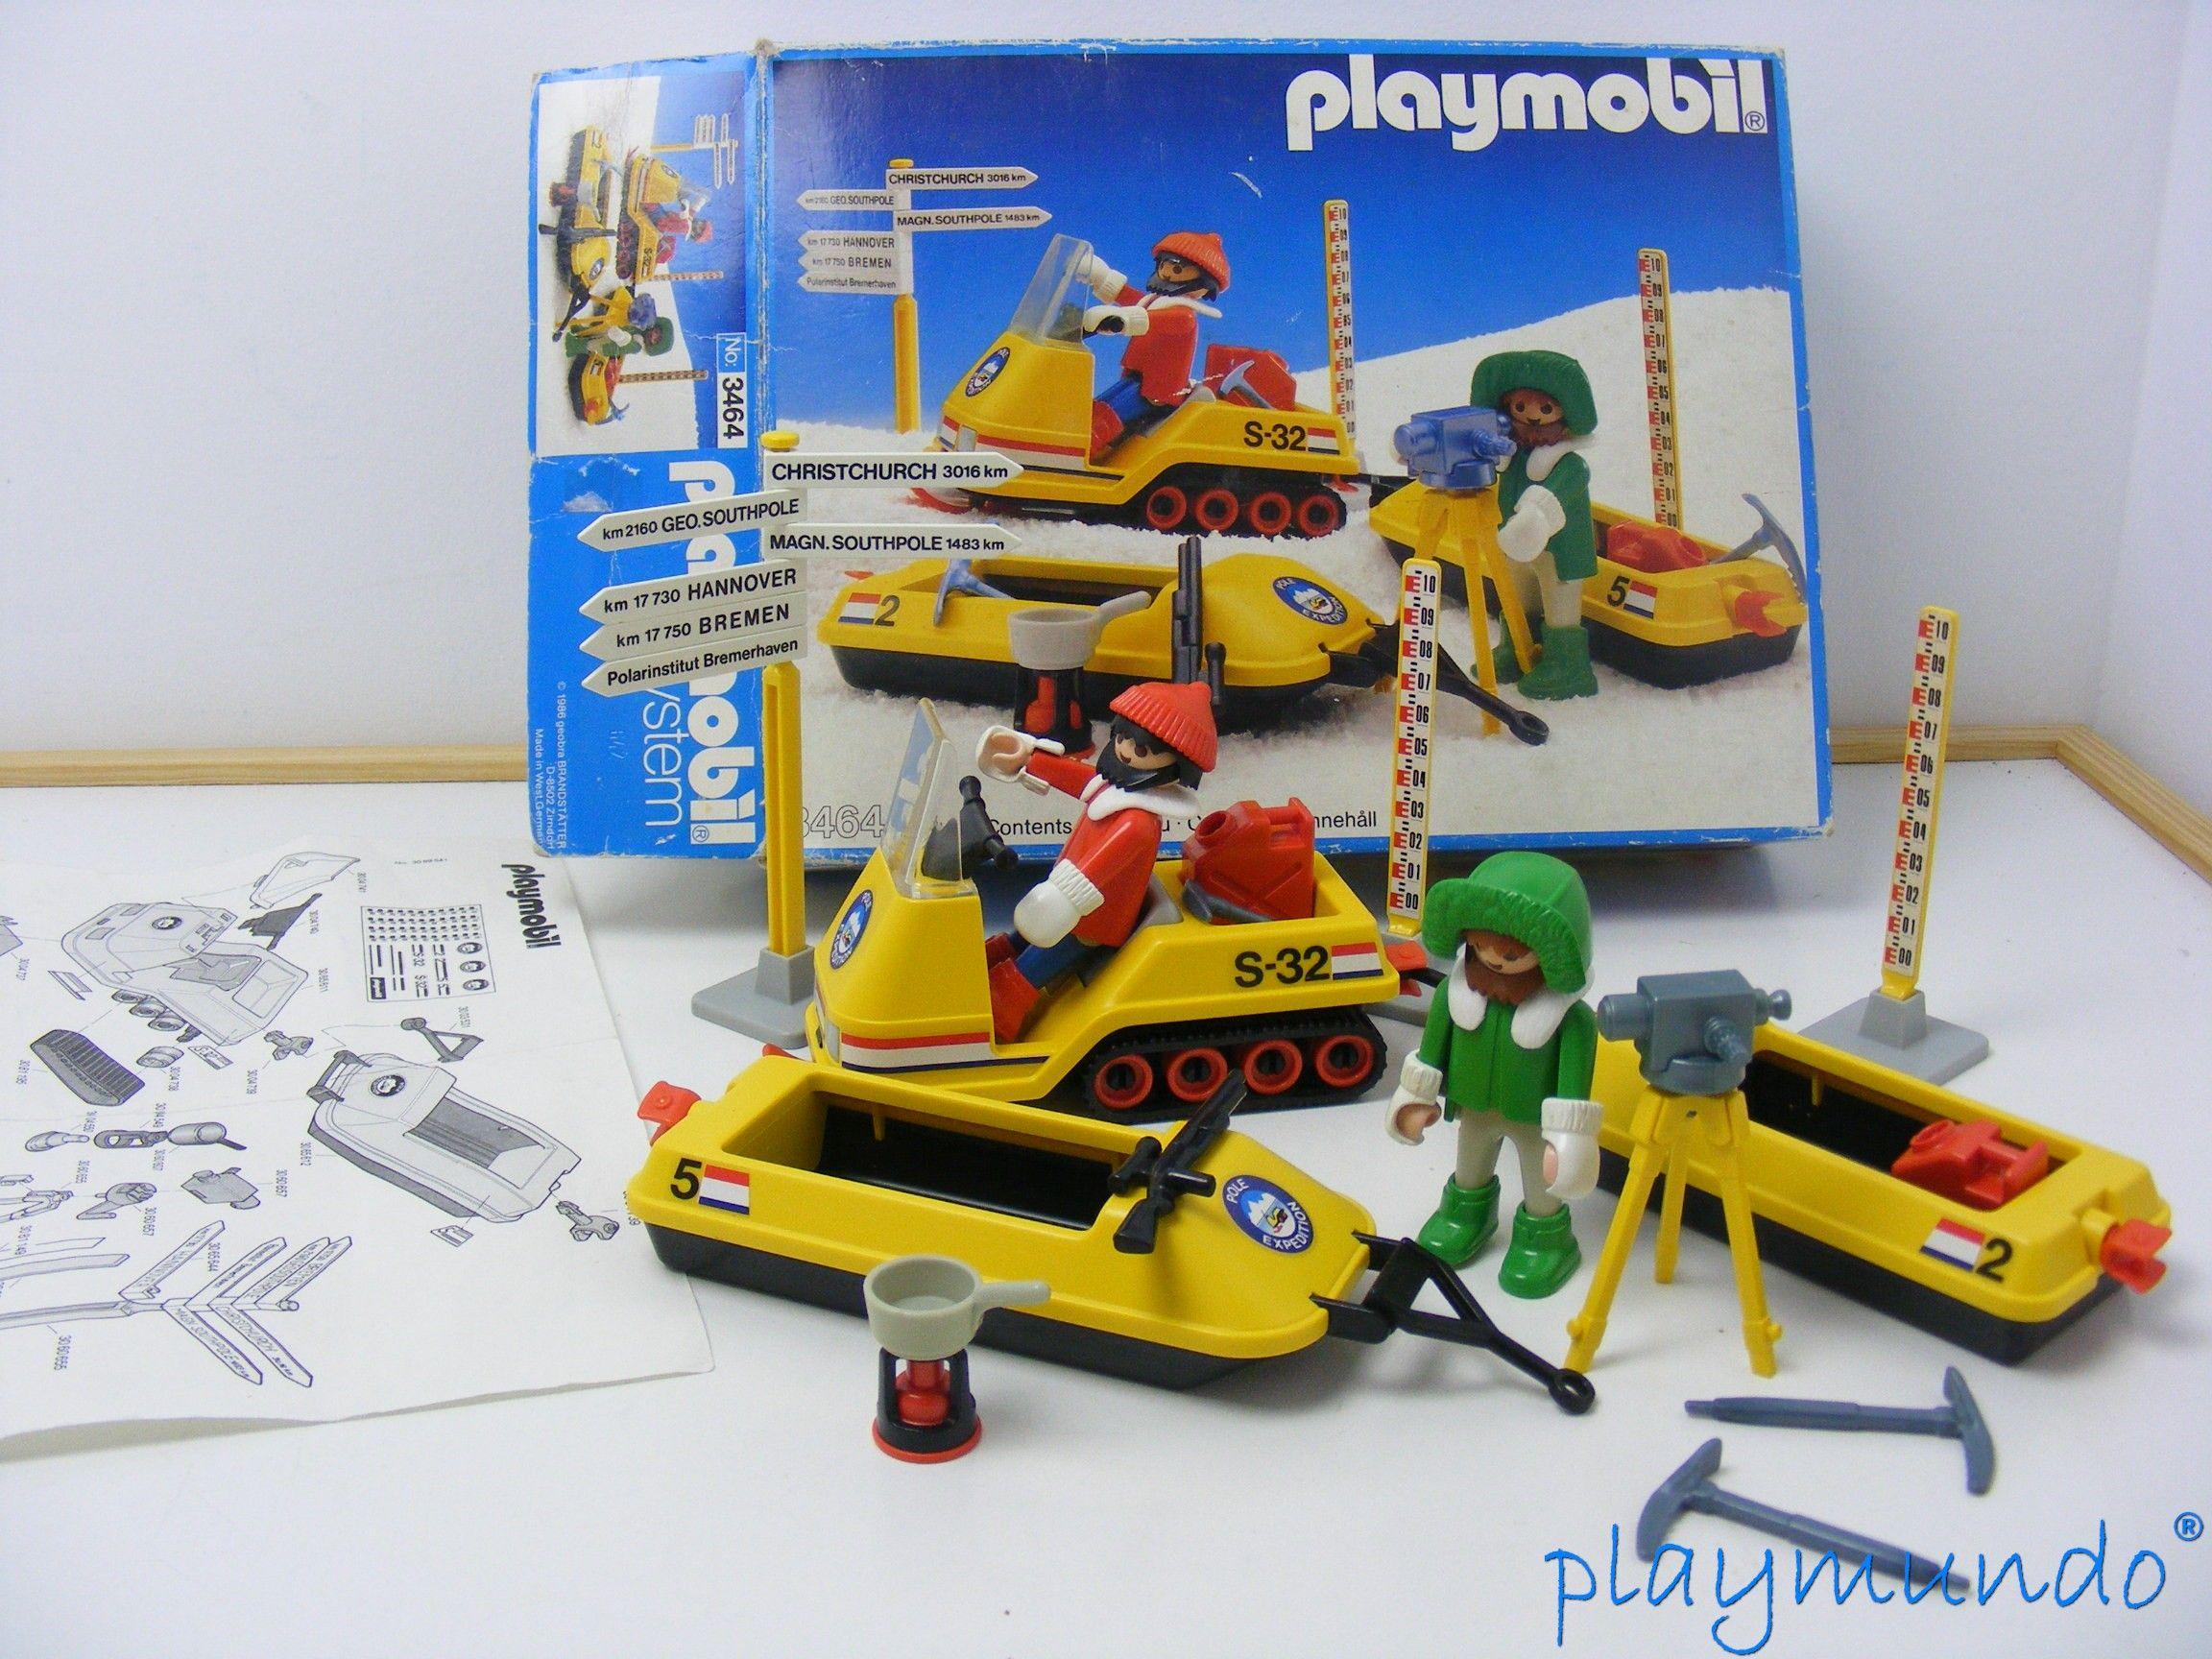 Playmobil Expedicion Polar Motonieve Ref 3464 Año 1986